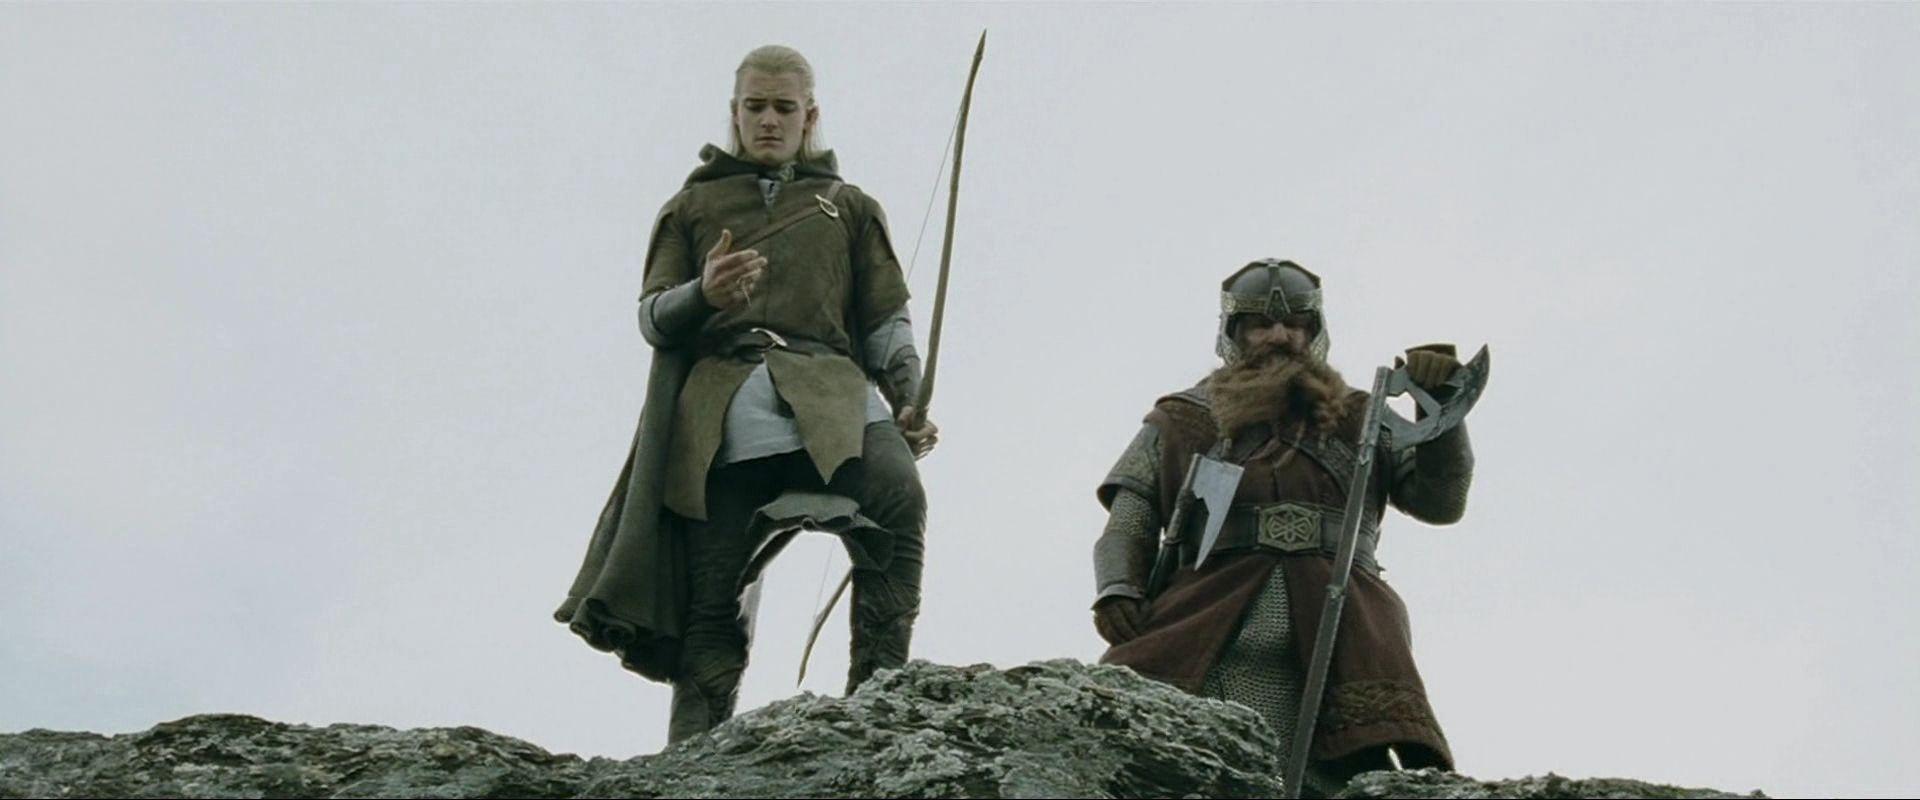 Photo: Legolas Greenleaf (Orlando Bloom) şi Gimli (John ...